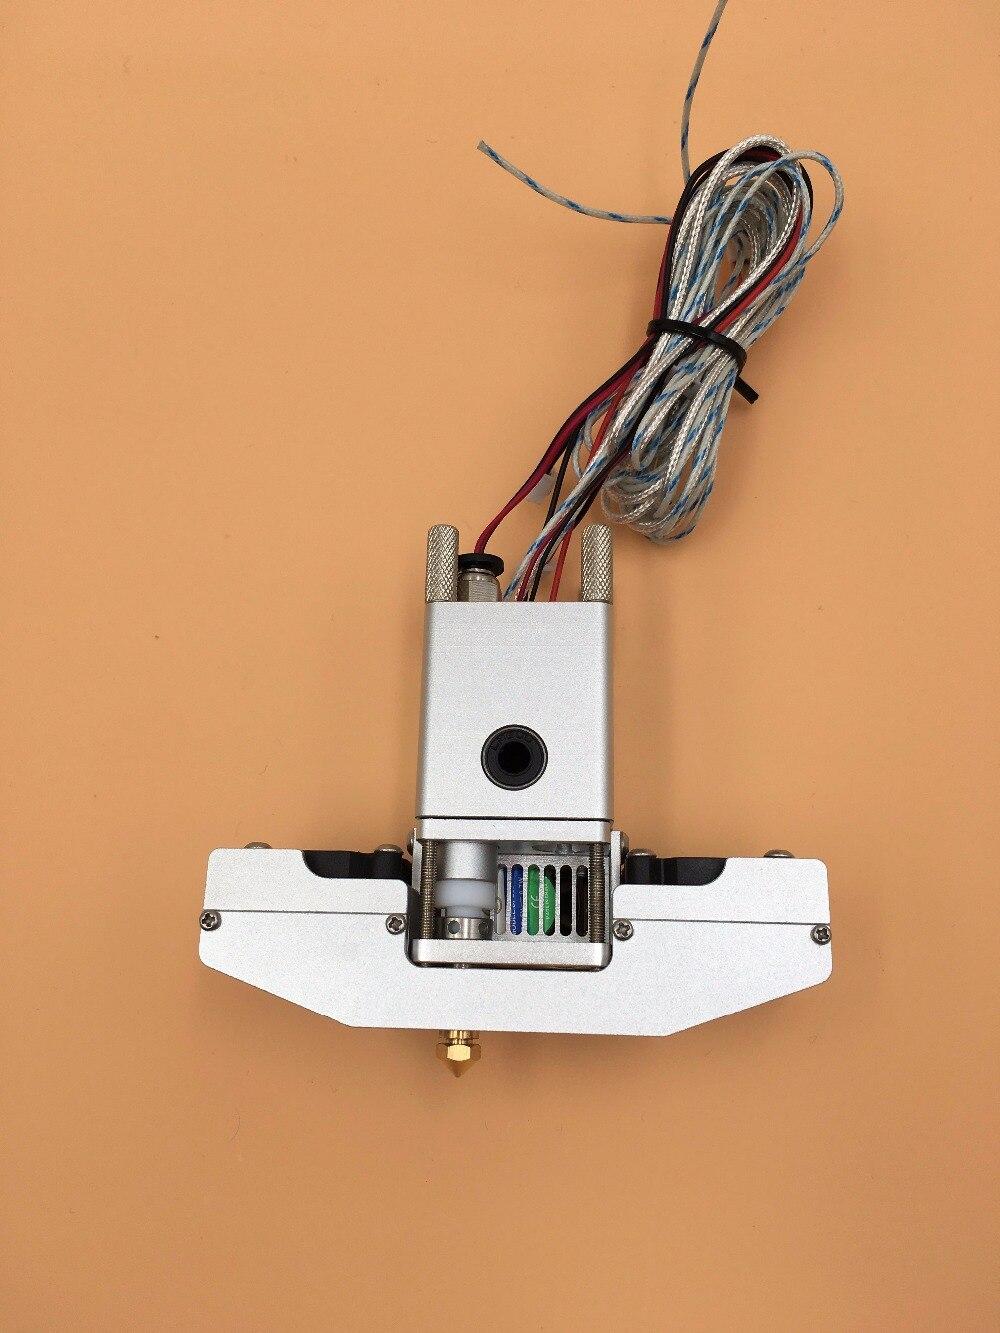 Blurolls Ultimaker 2+ 3d printer hot end full kit aluminum 1.75/3mm Olsson block and nozzle pt100 sensor and heater cartridge